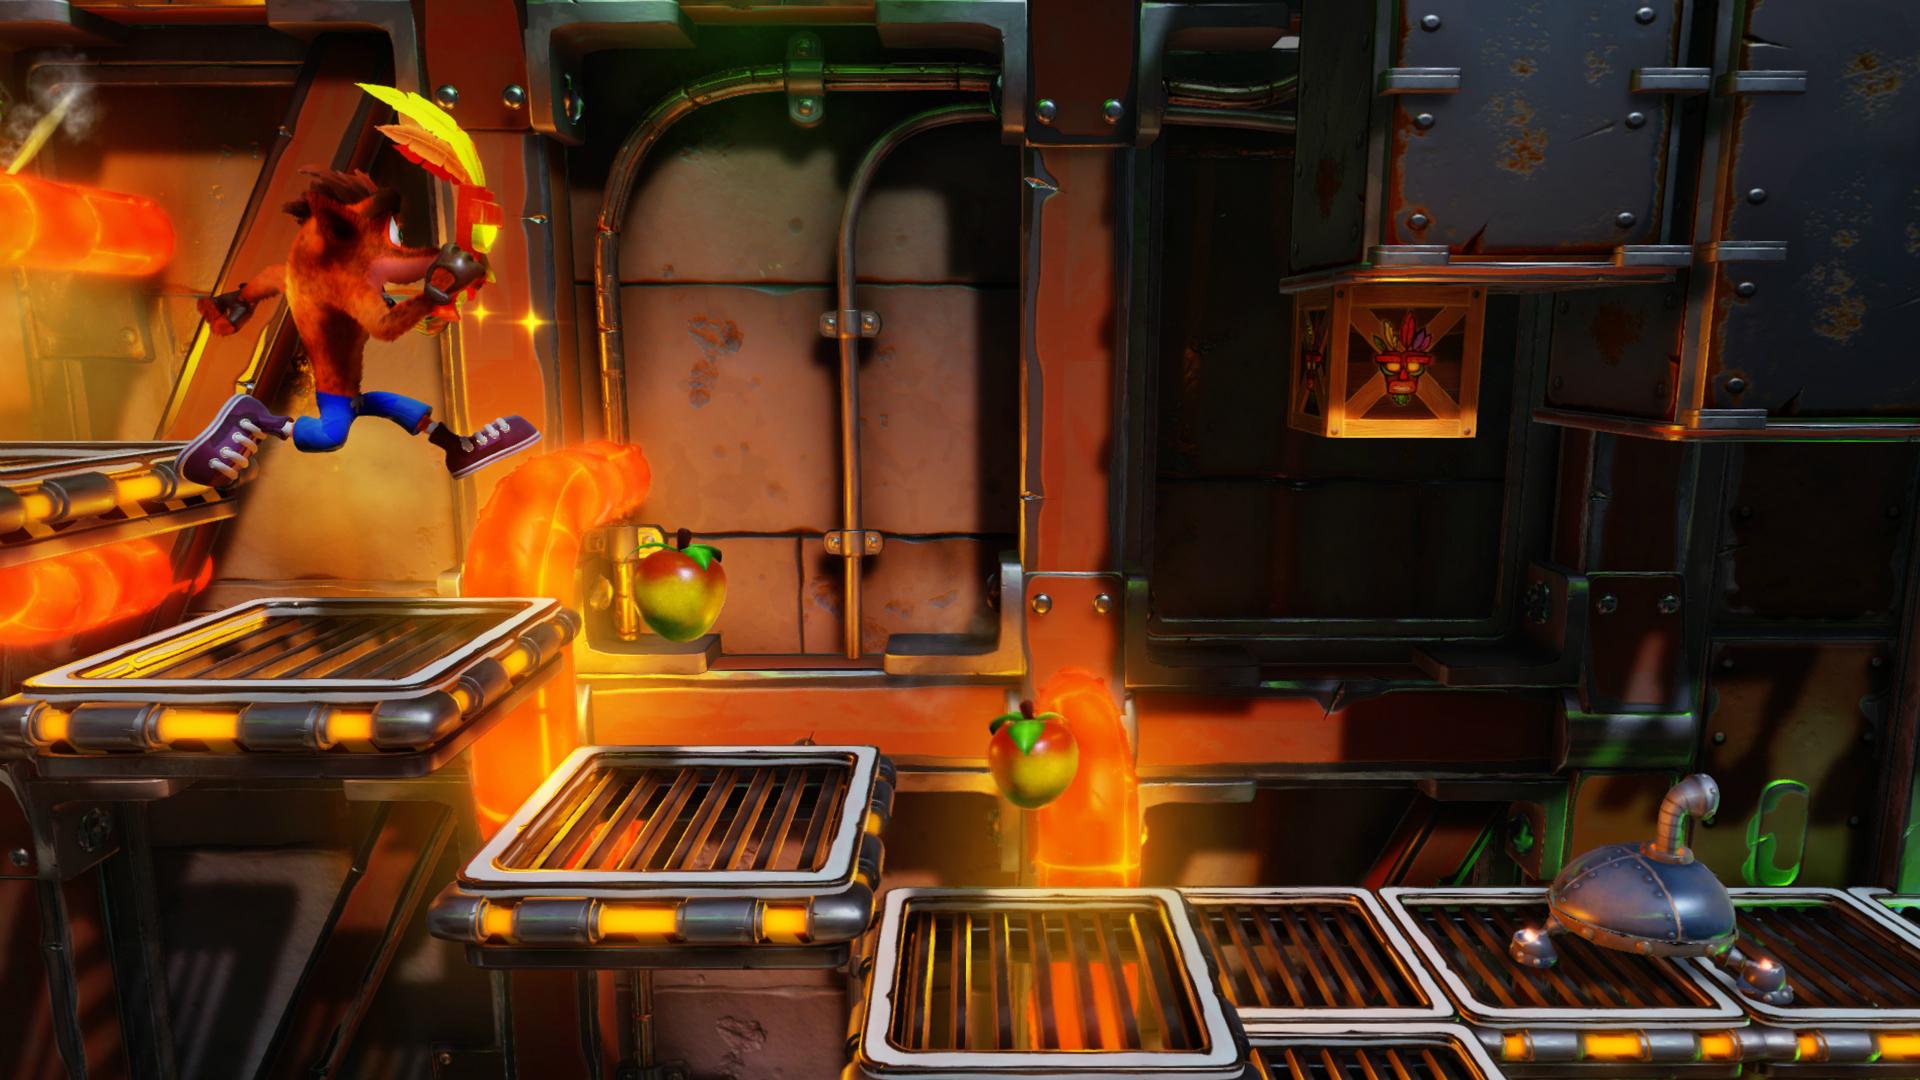 Vicarious Visions on Crash Bandicoot: Nsane Trilogy